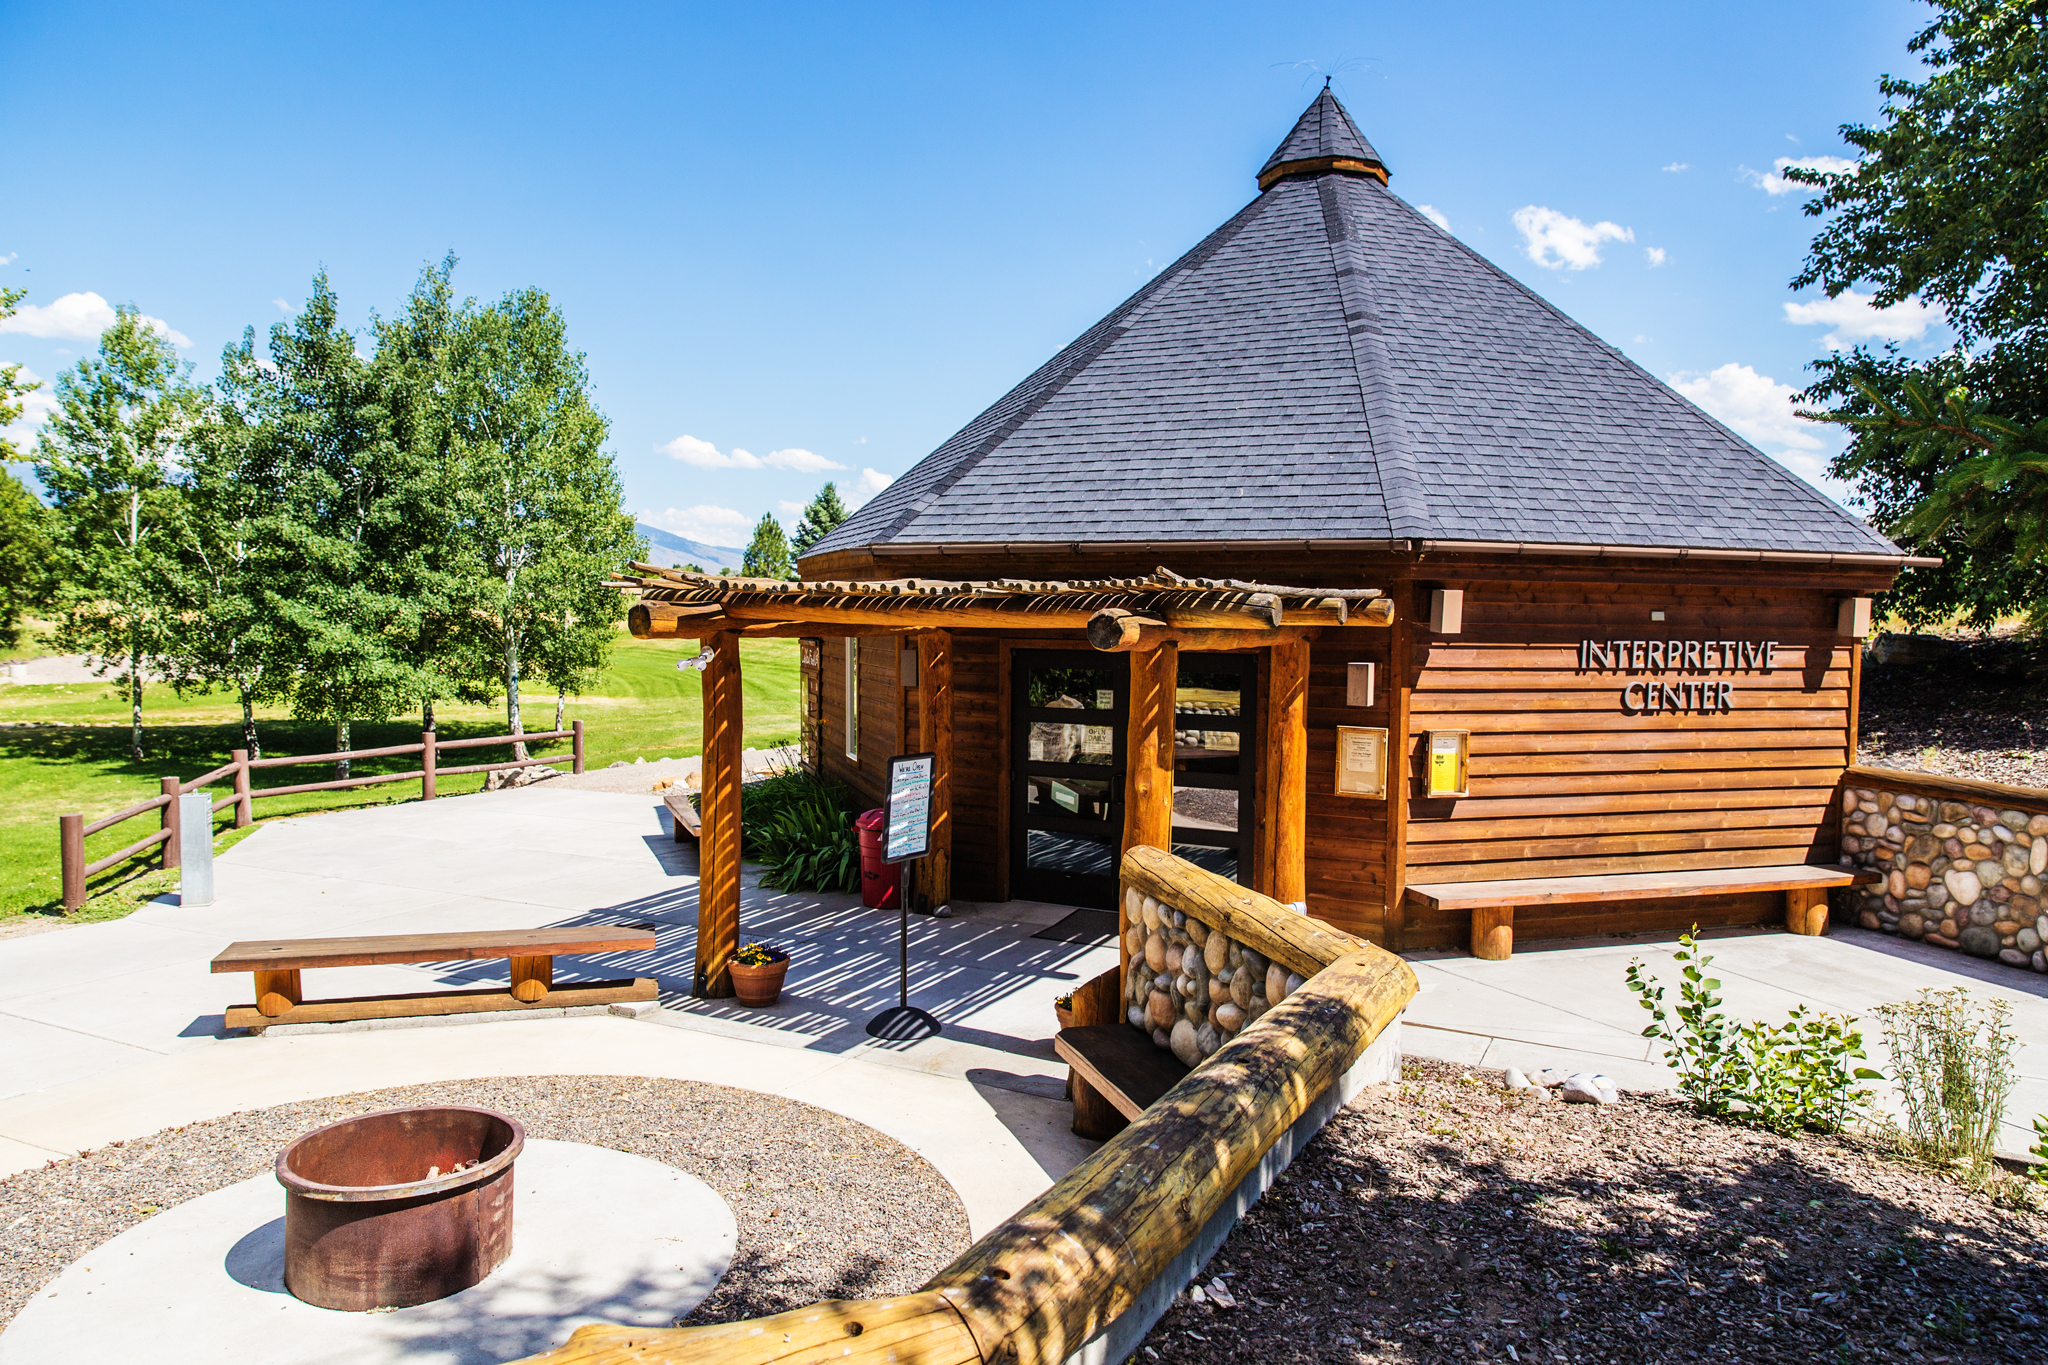 Sacajawea Visitor Center